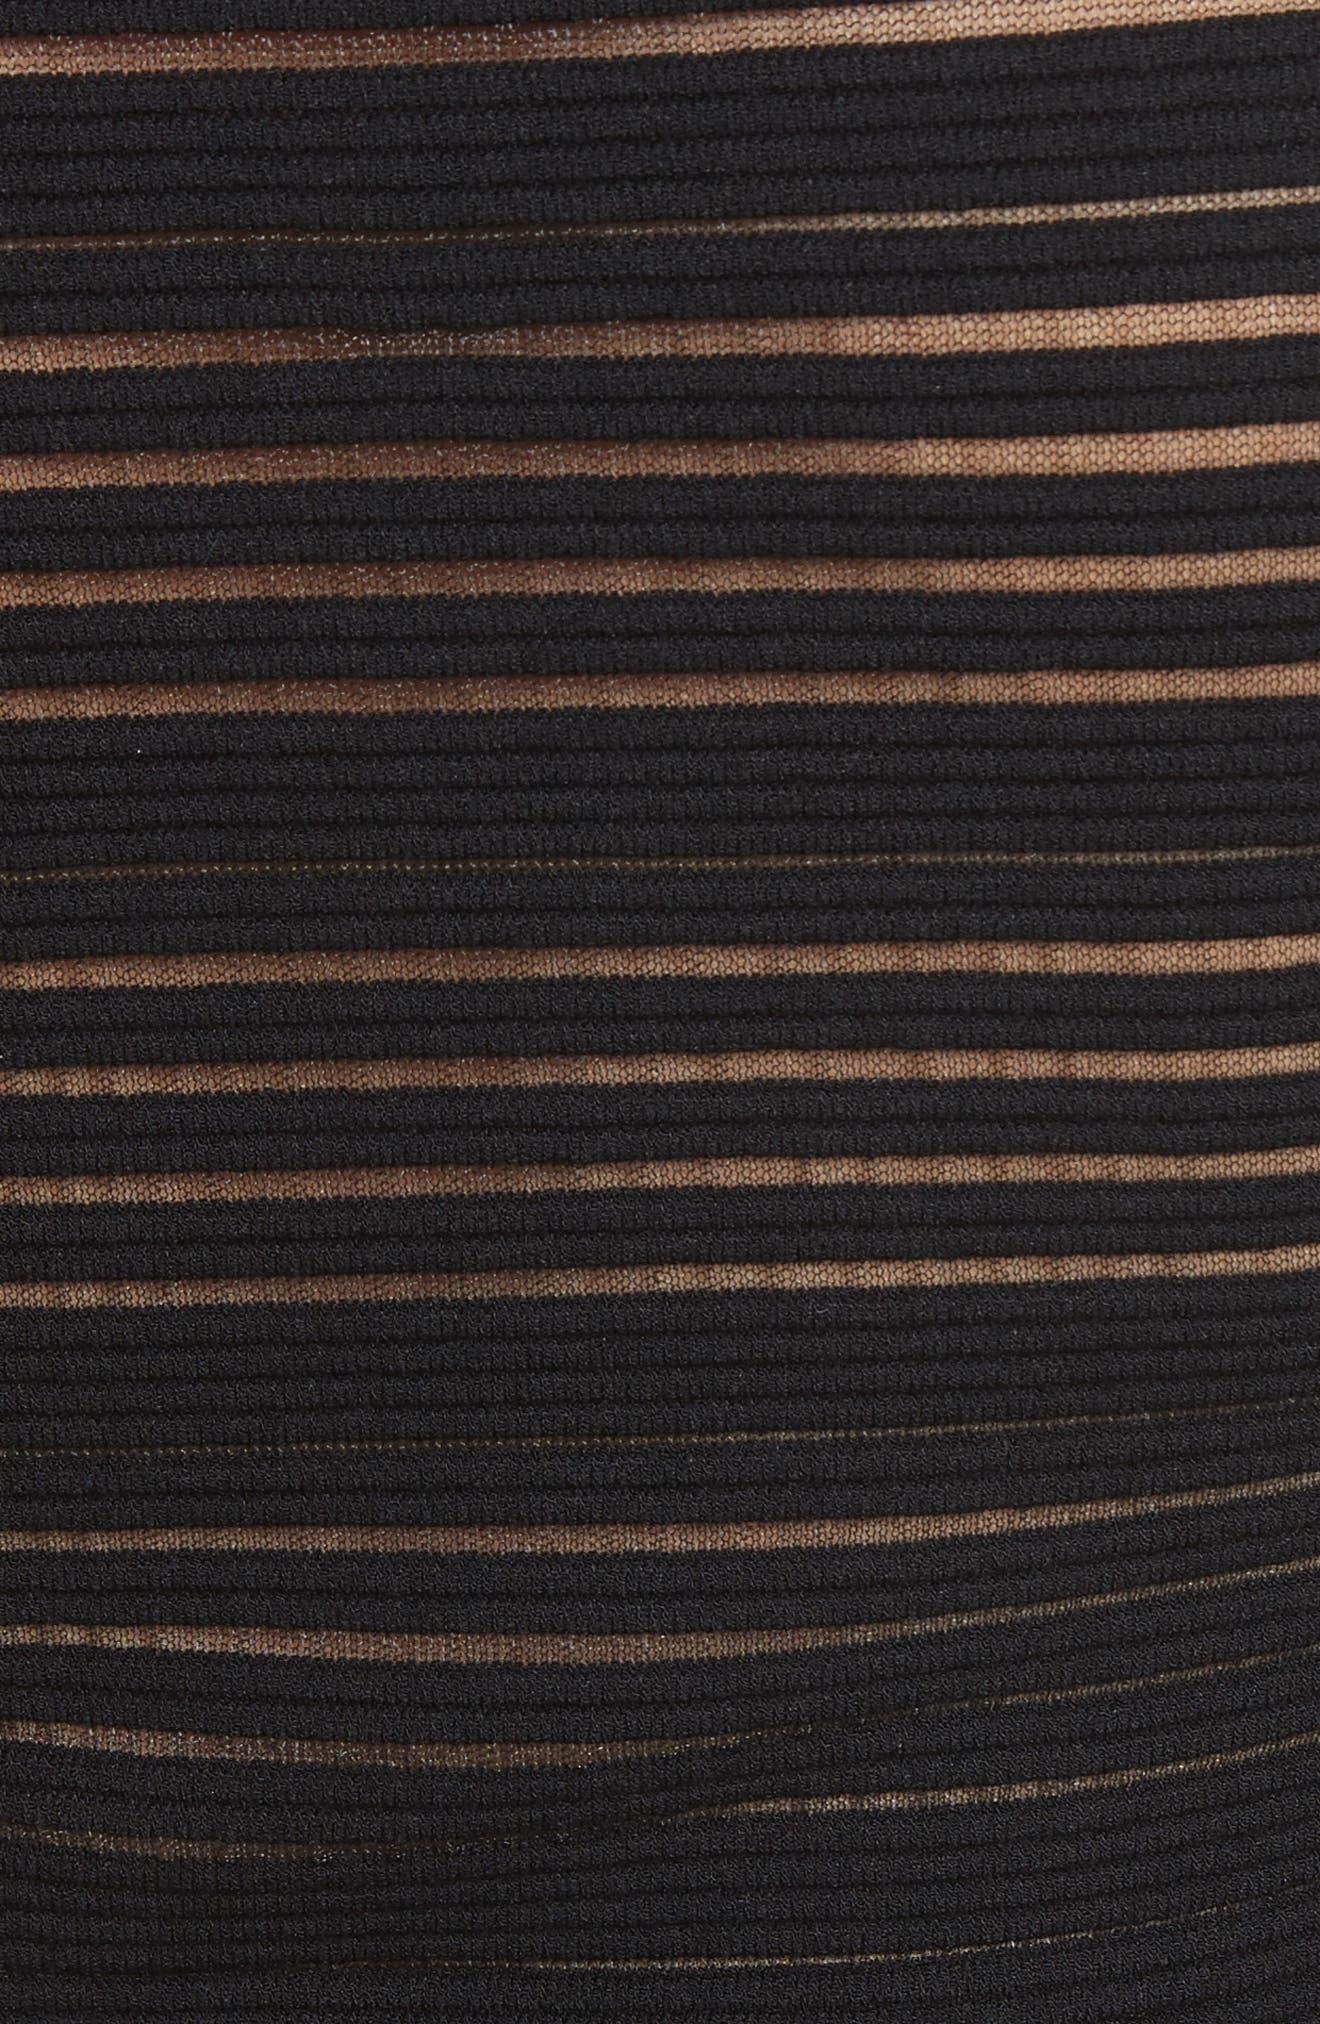 Stripe Knit A-Line Dress,                             Alternate thumbnail 5, color,                             001